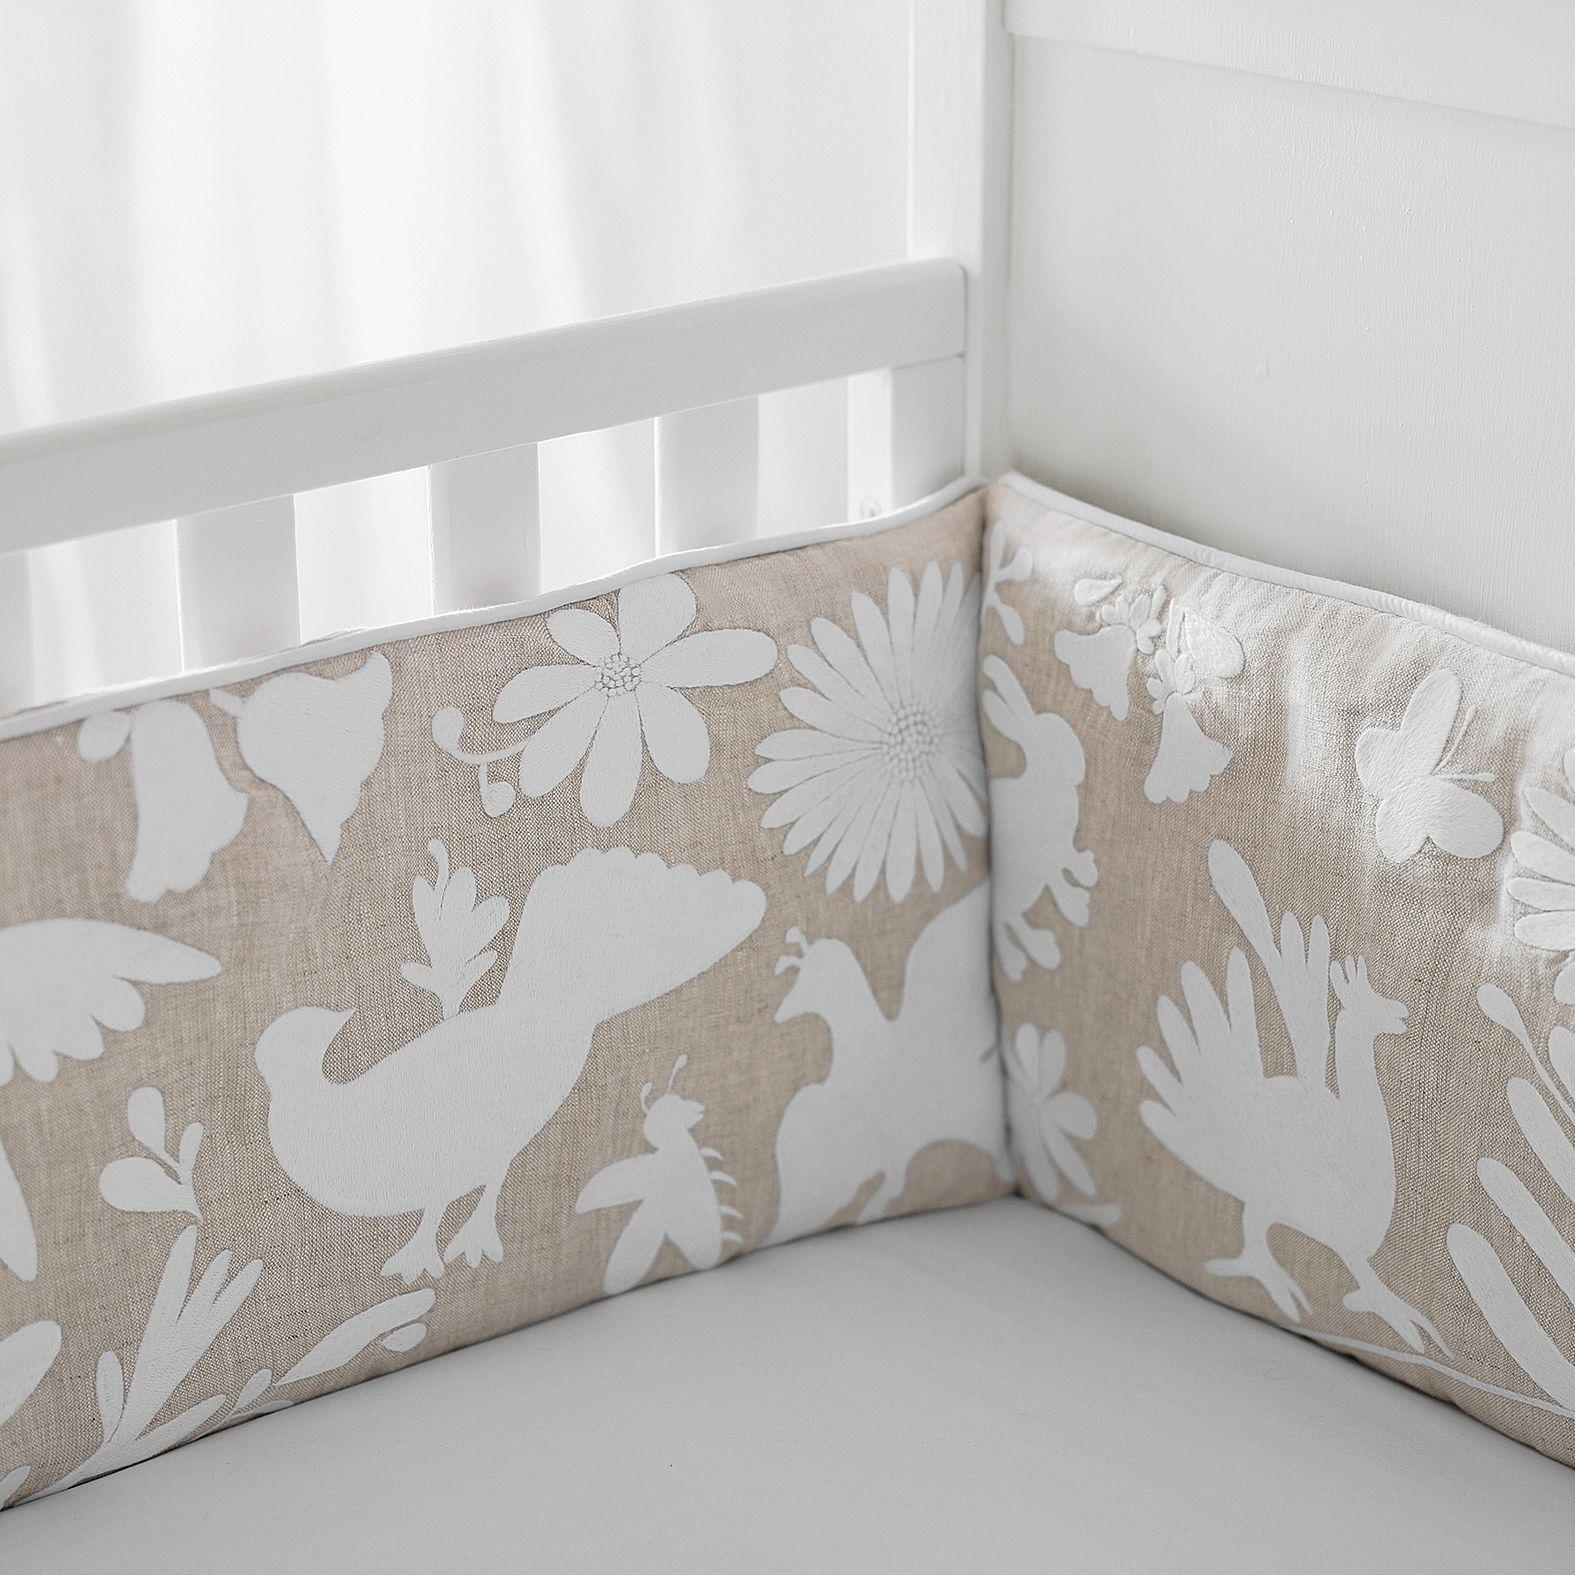 Marlo Crib Bedding Collection For Baby Nursery Serena Lily